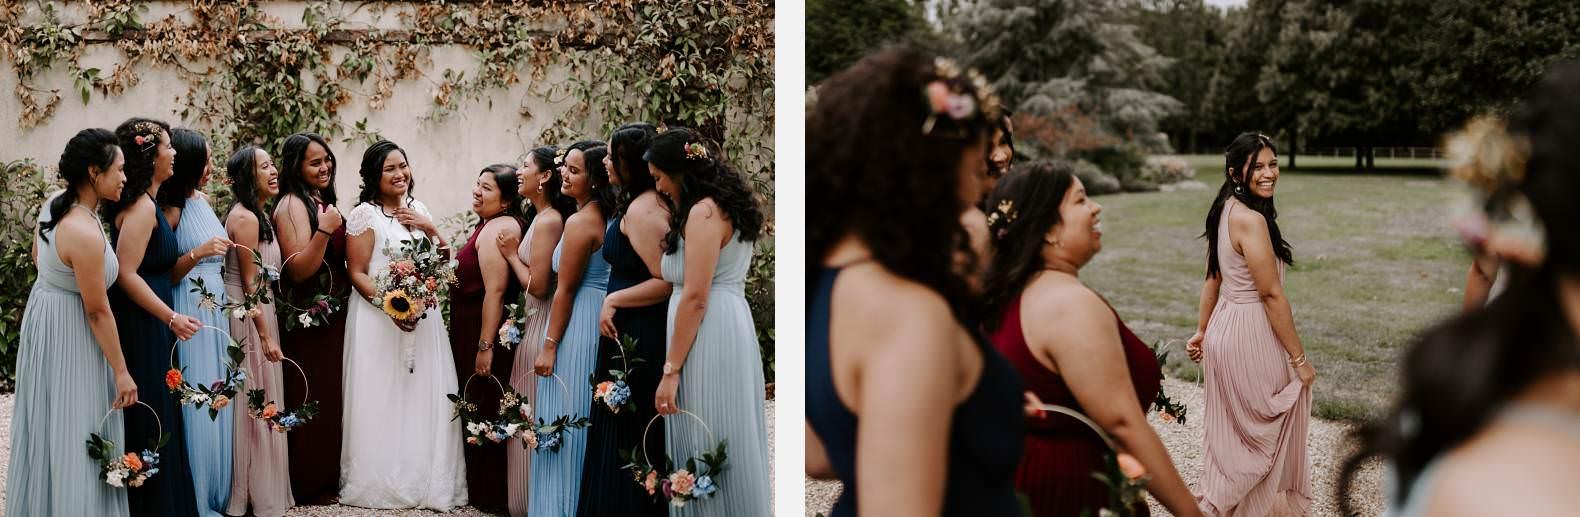 mariage manoir de corny photographe bel esprit 0052 1